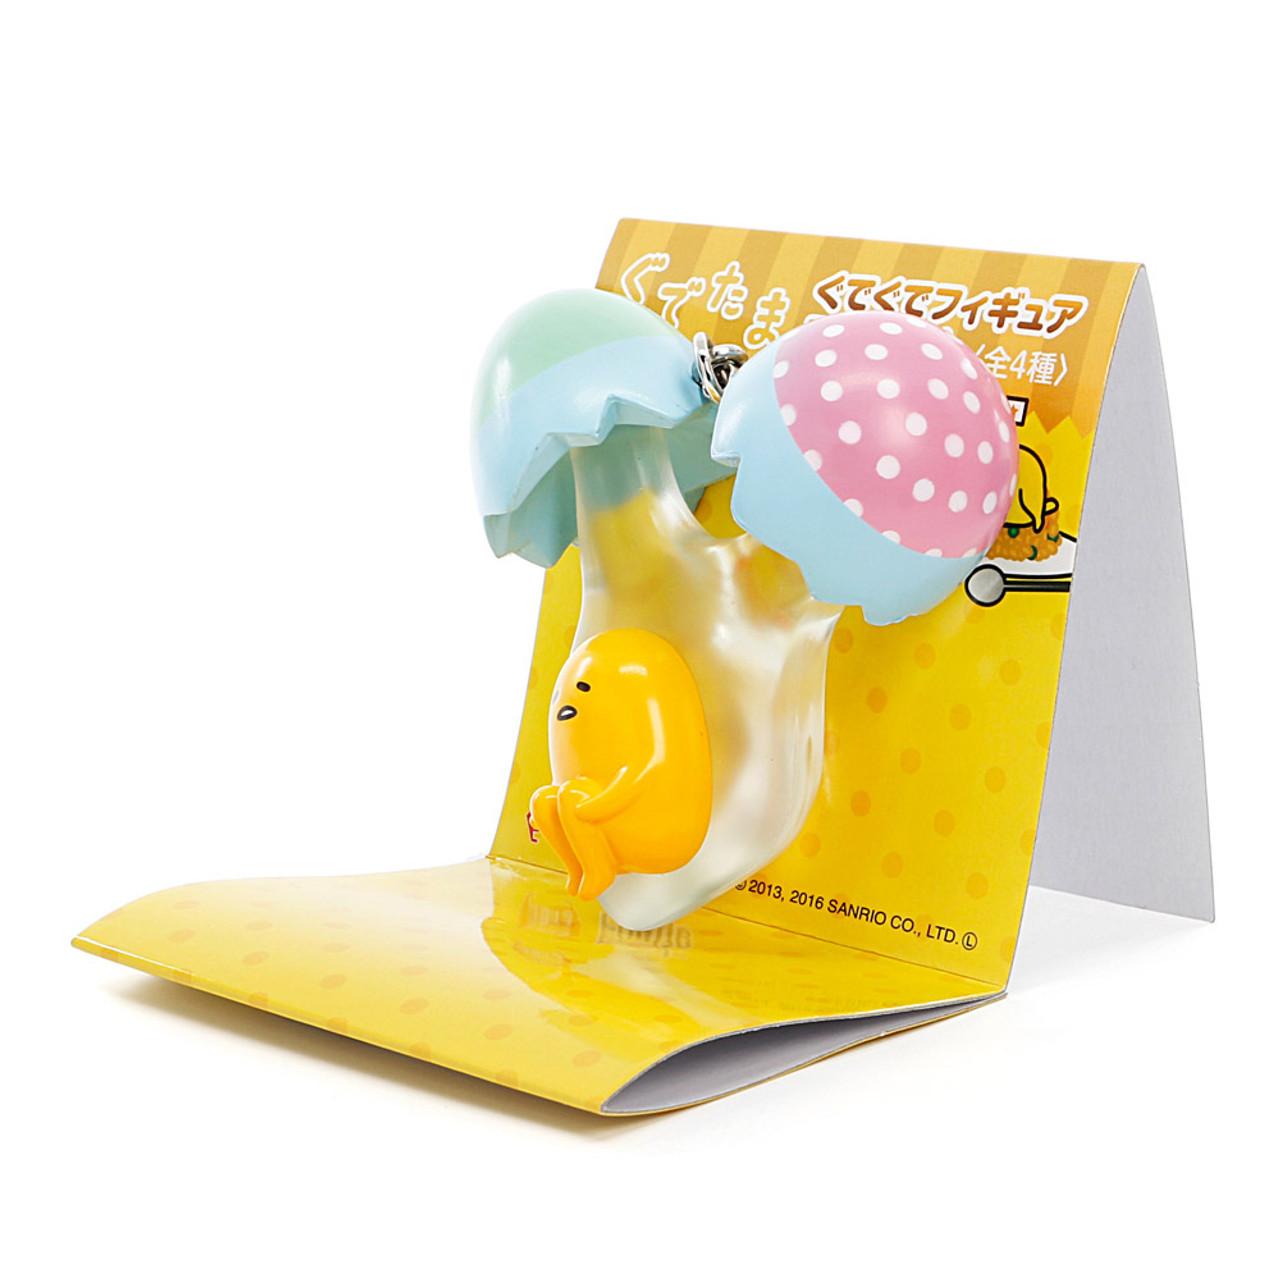 Sanrio Gudetama Lazy Egg Omelet Mascot Mobile Charms - Peel The Egg ( 45 Degree Angle View )